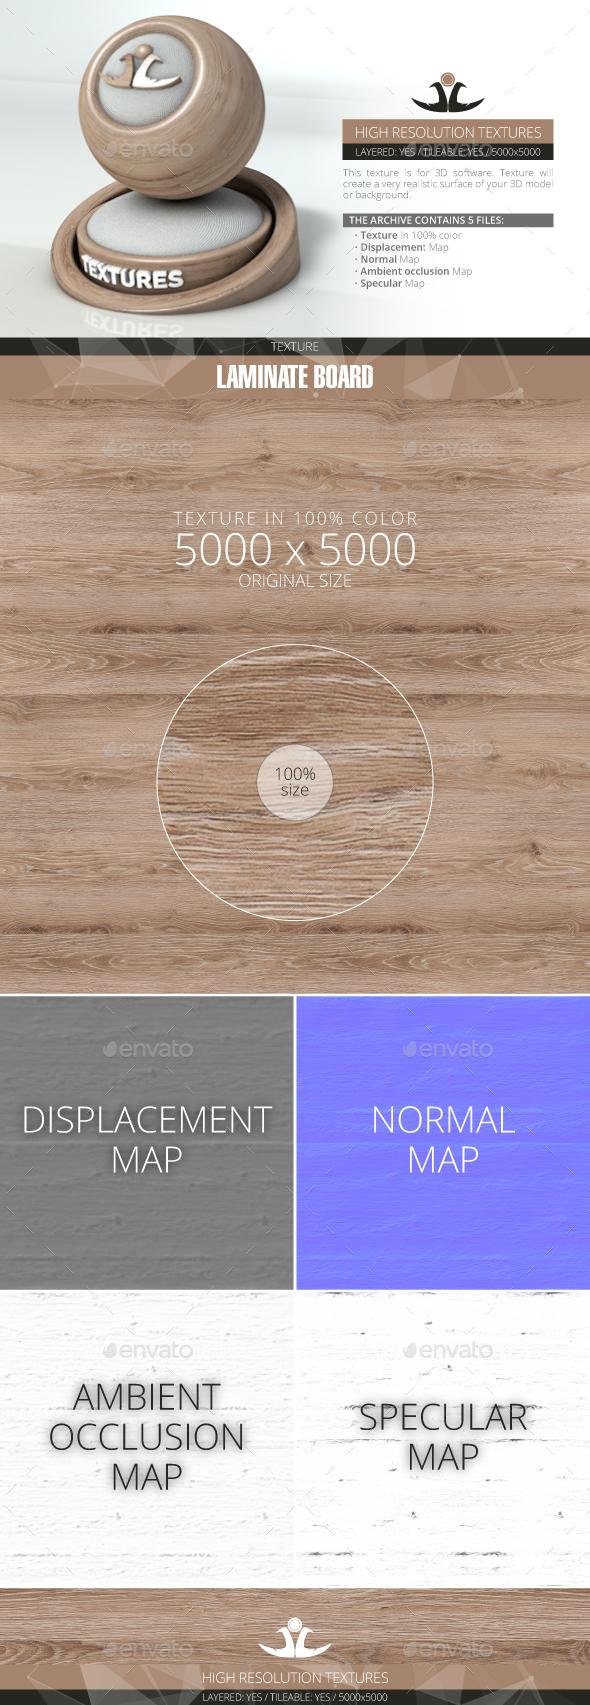 Laminate Board 9 - 3DOcean Item for Sale